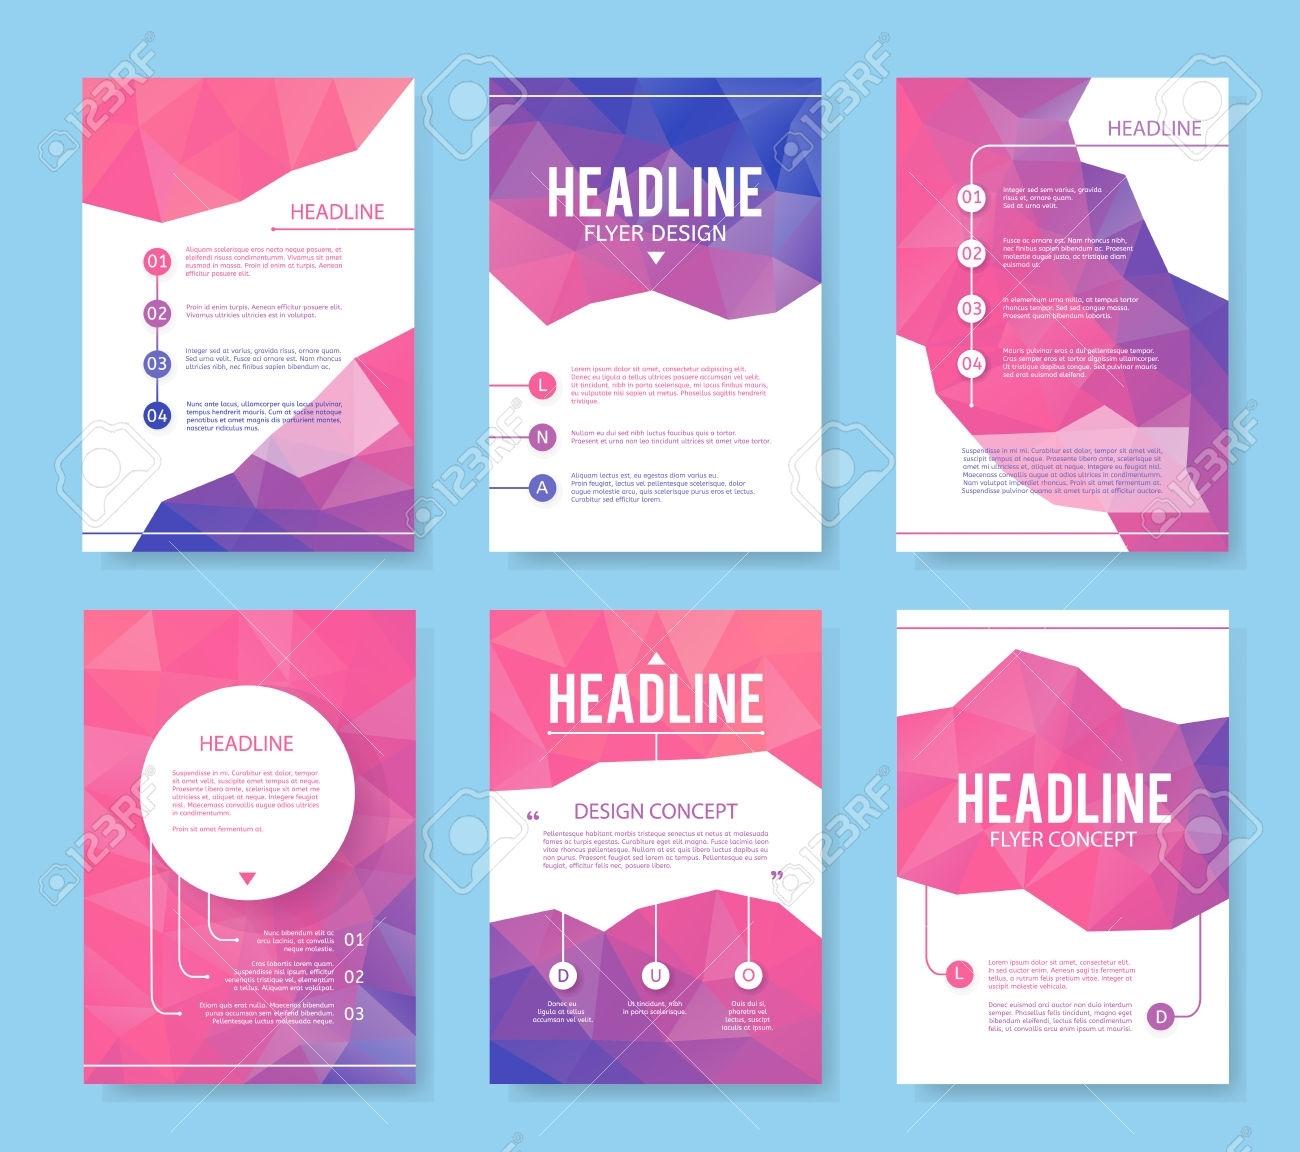 Blank Brochure Templates Free Inspirational Blank Flyer Templates - Free Printable Brochure Templates